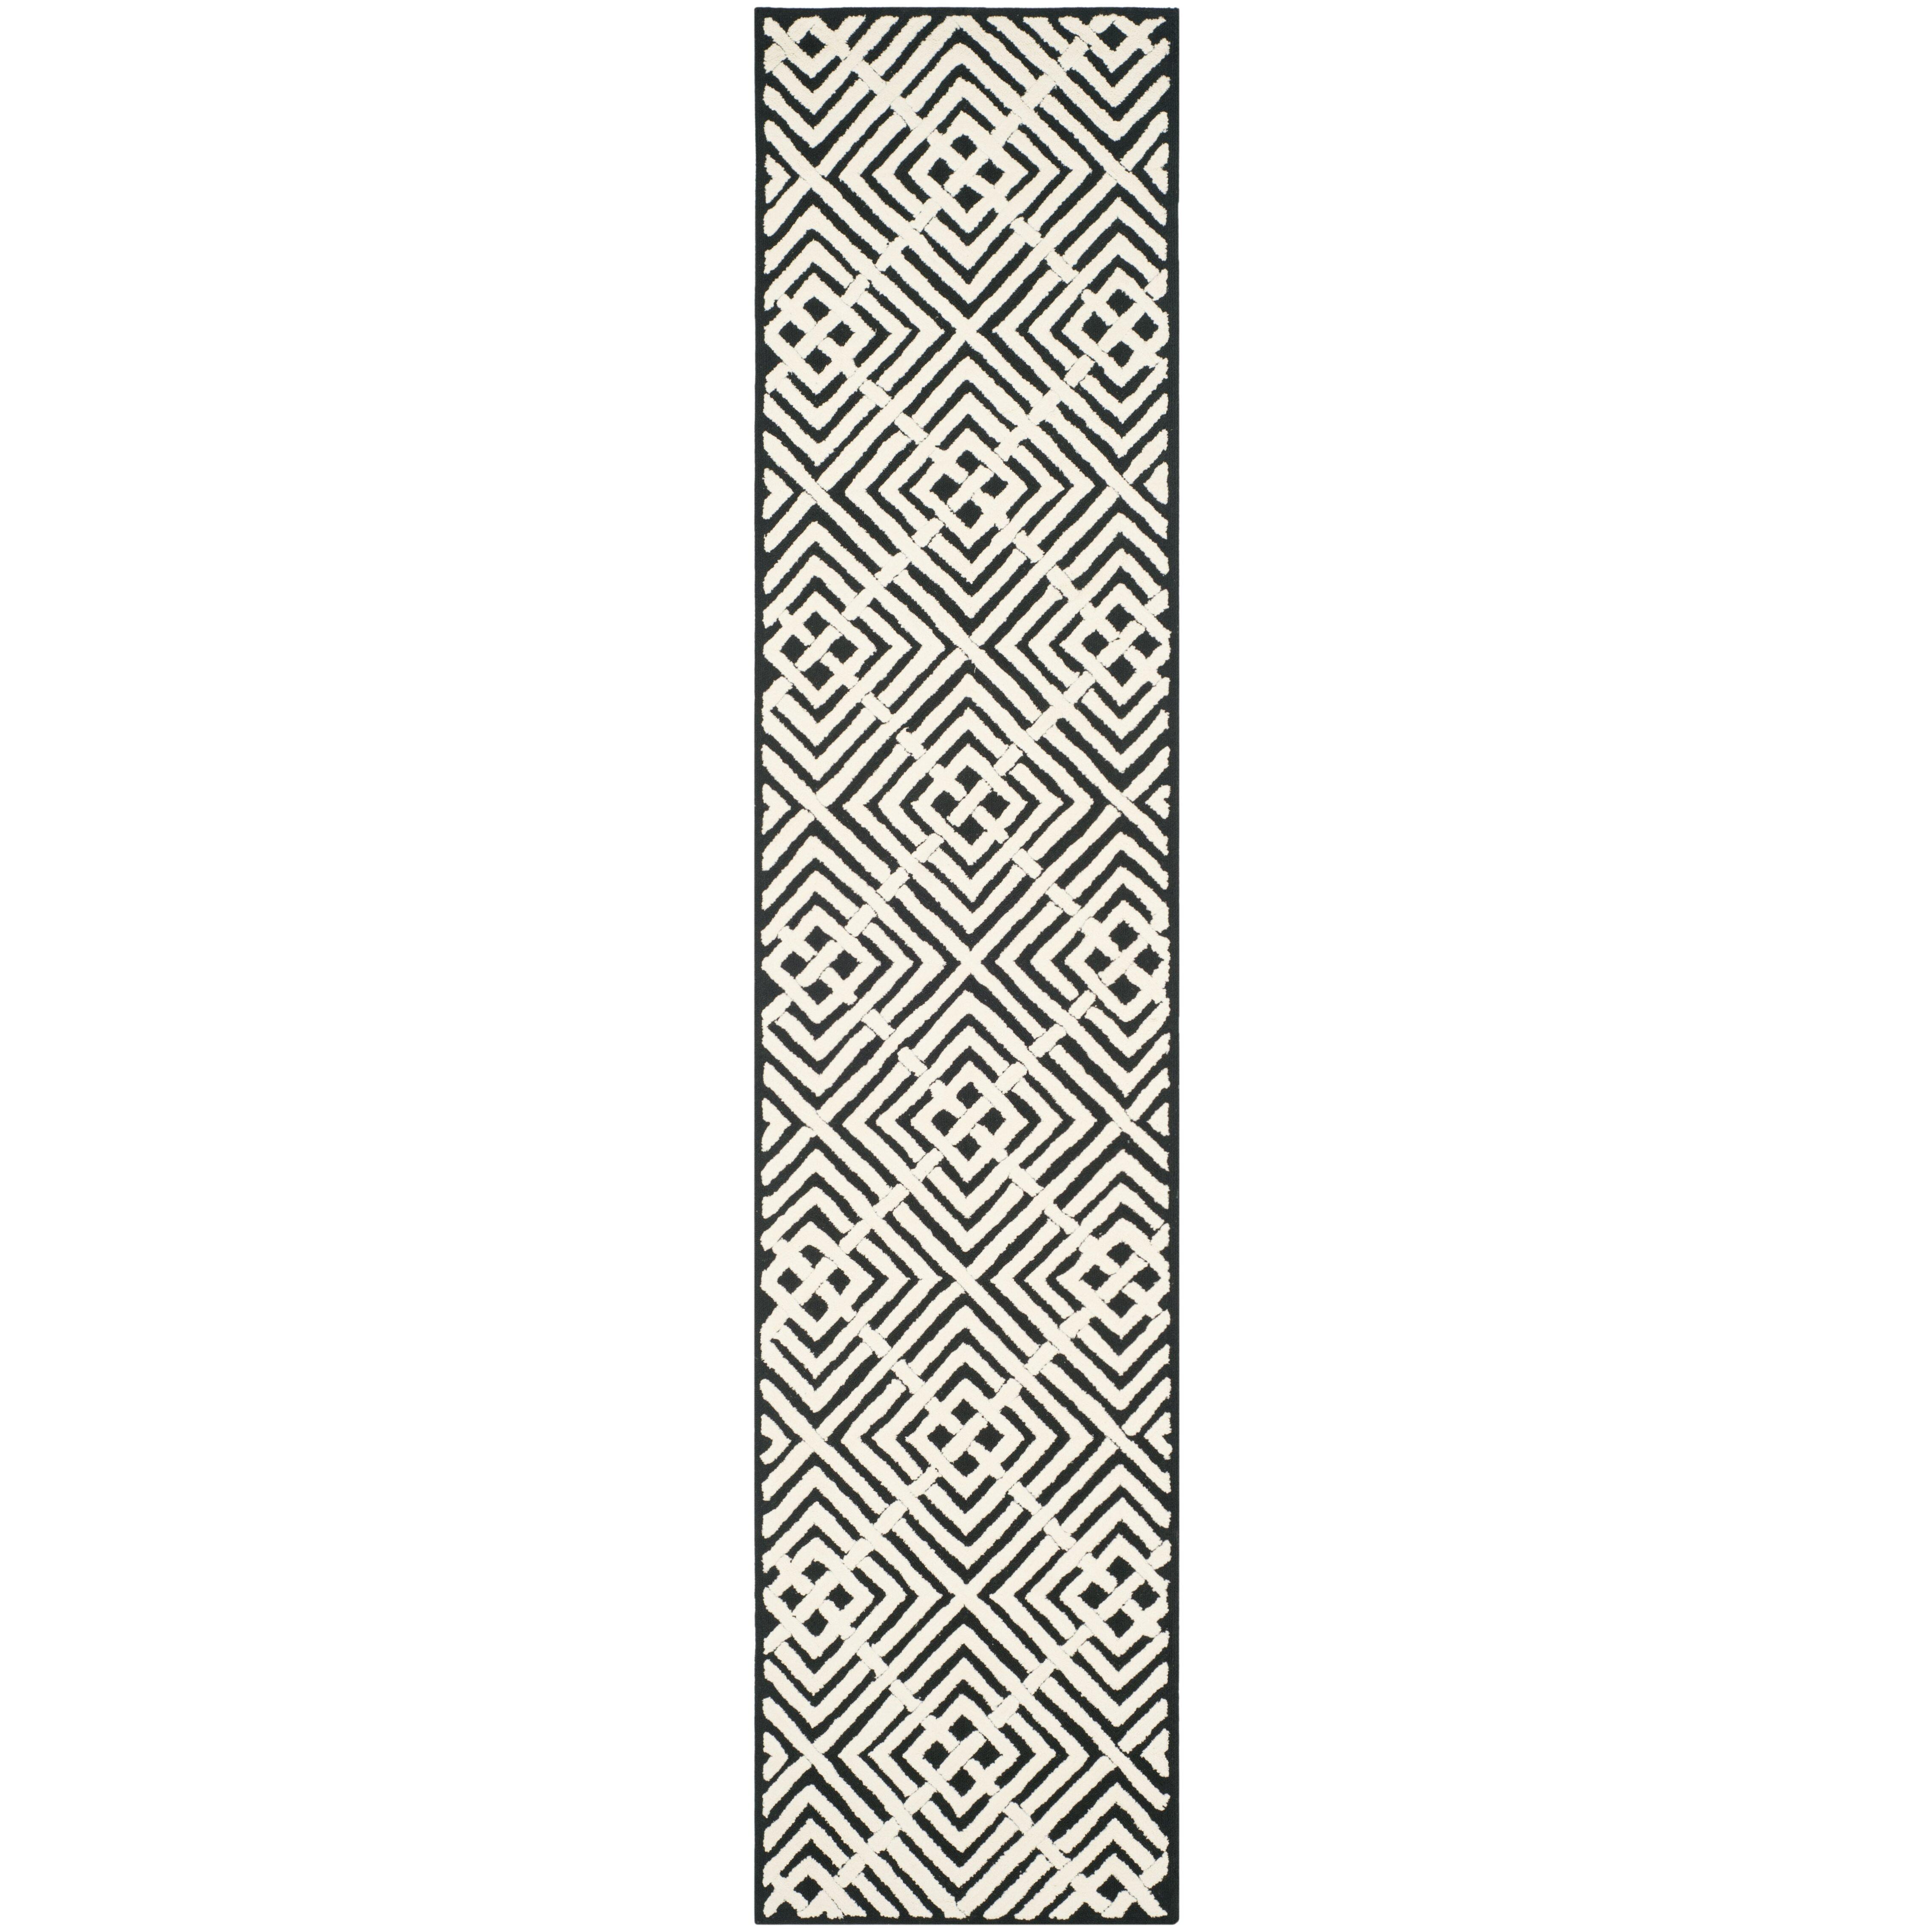 Black And White Geometric Kitchen Rug: Safavieh Newport Black/White Geometric Area Rug & Reviews